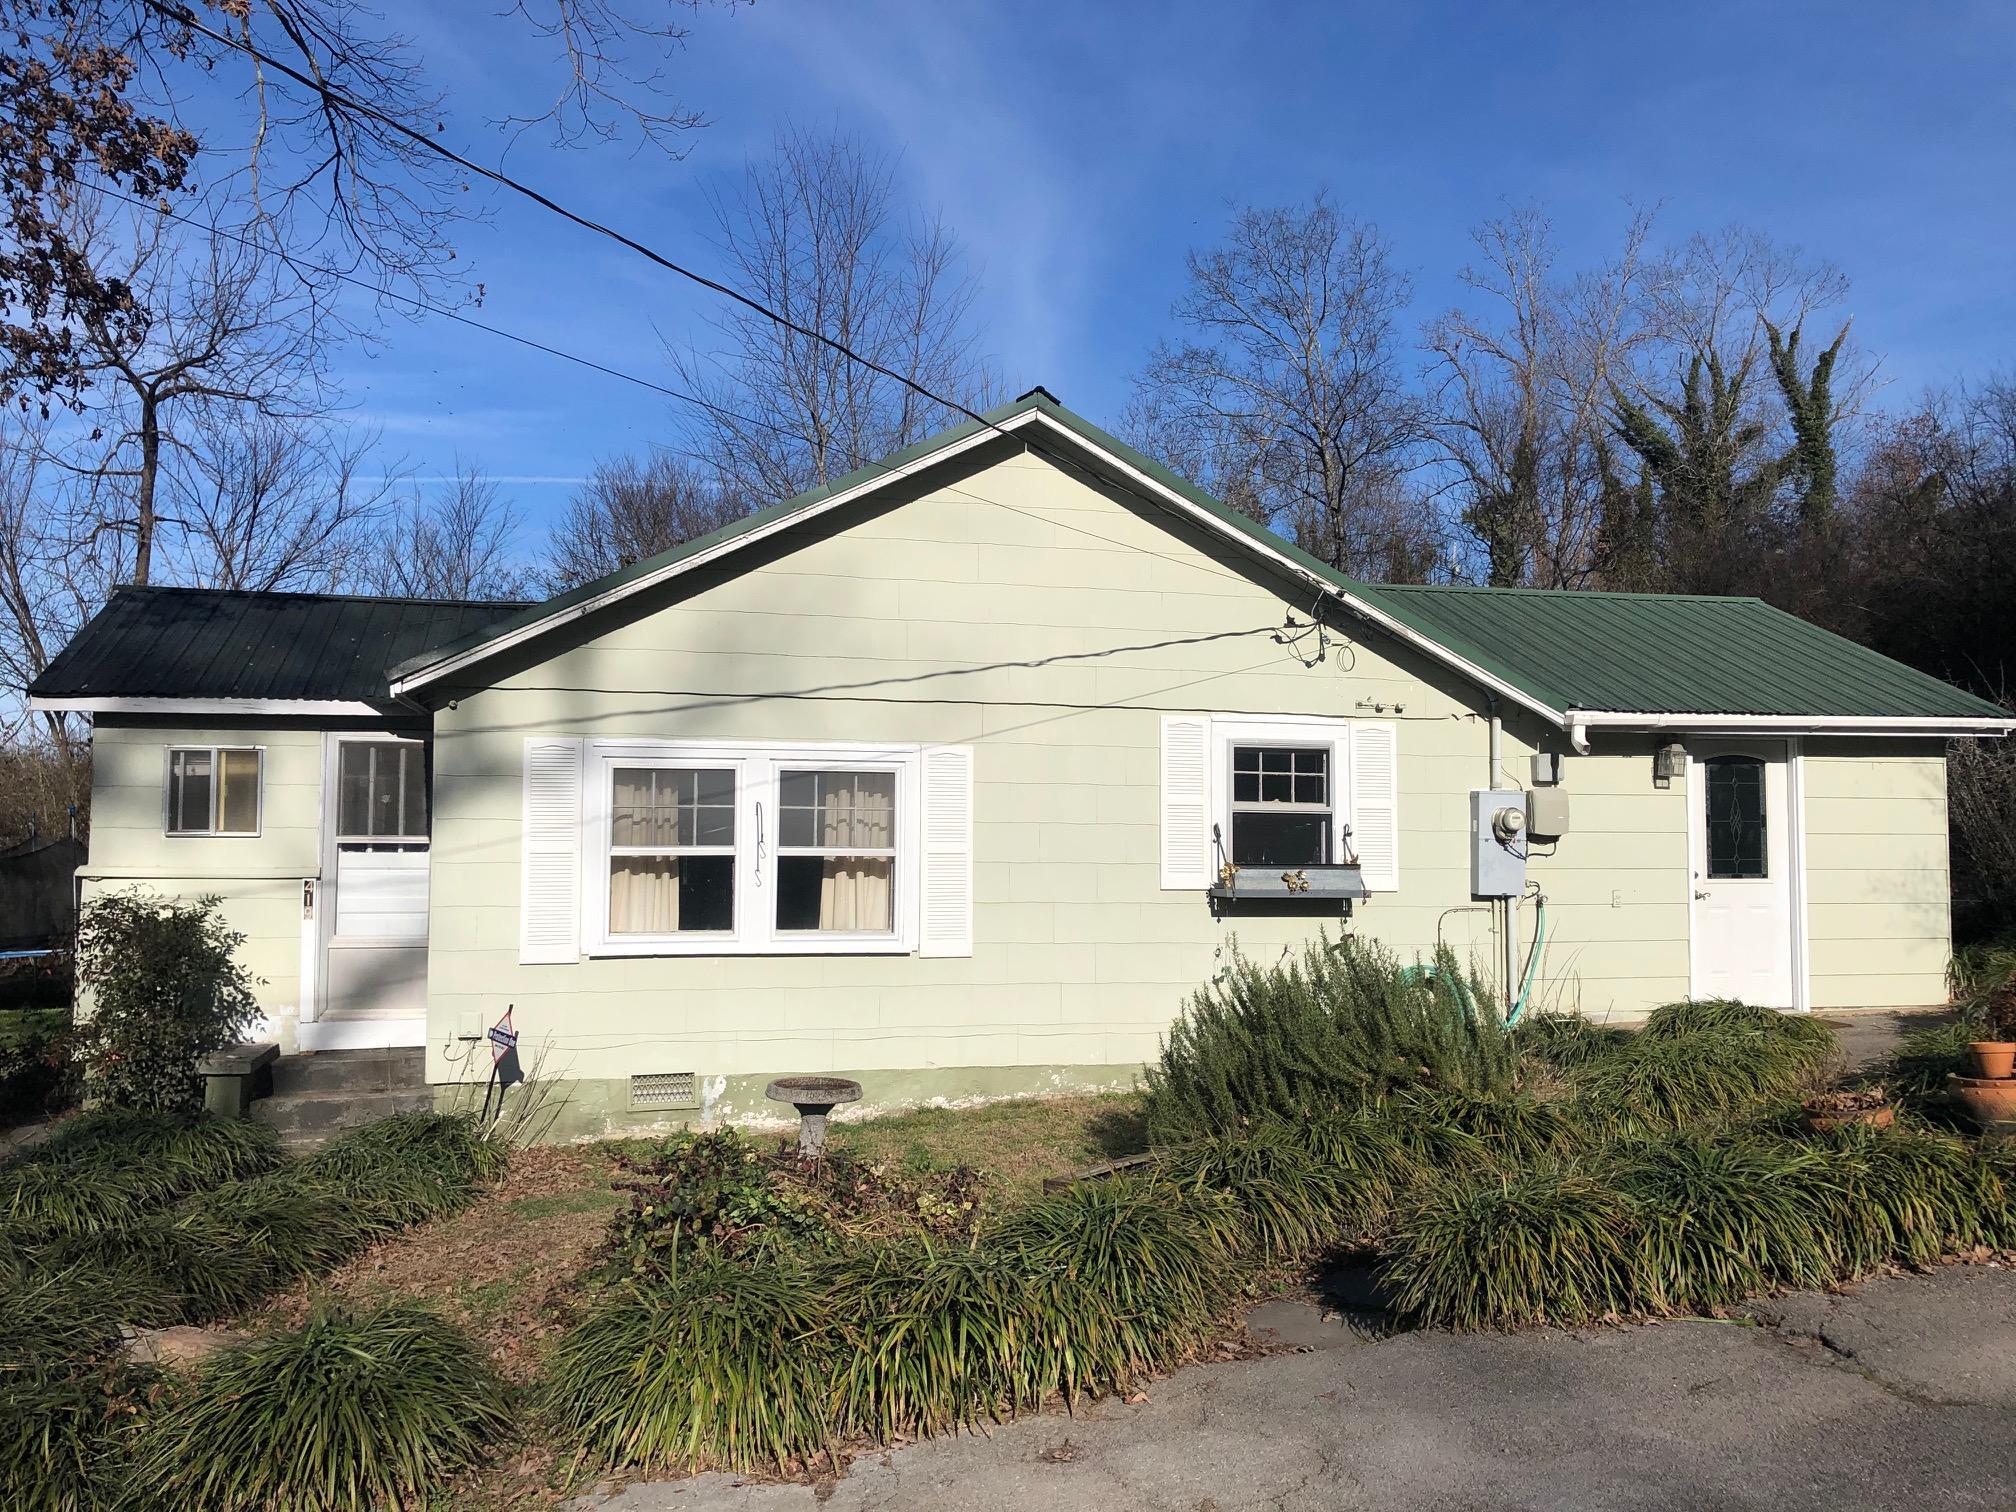 419 Blanche St, Hixson, TN 37343